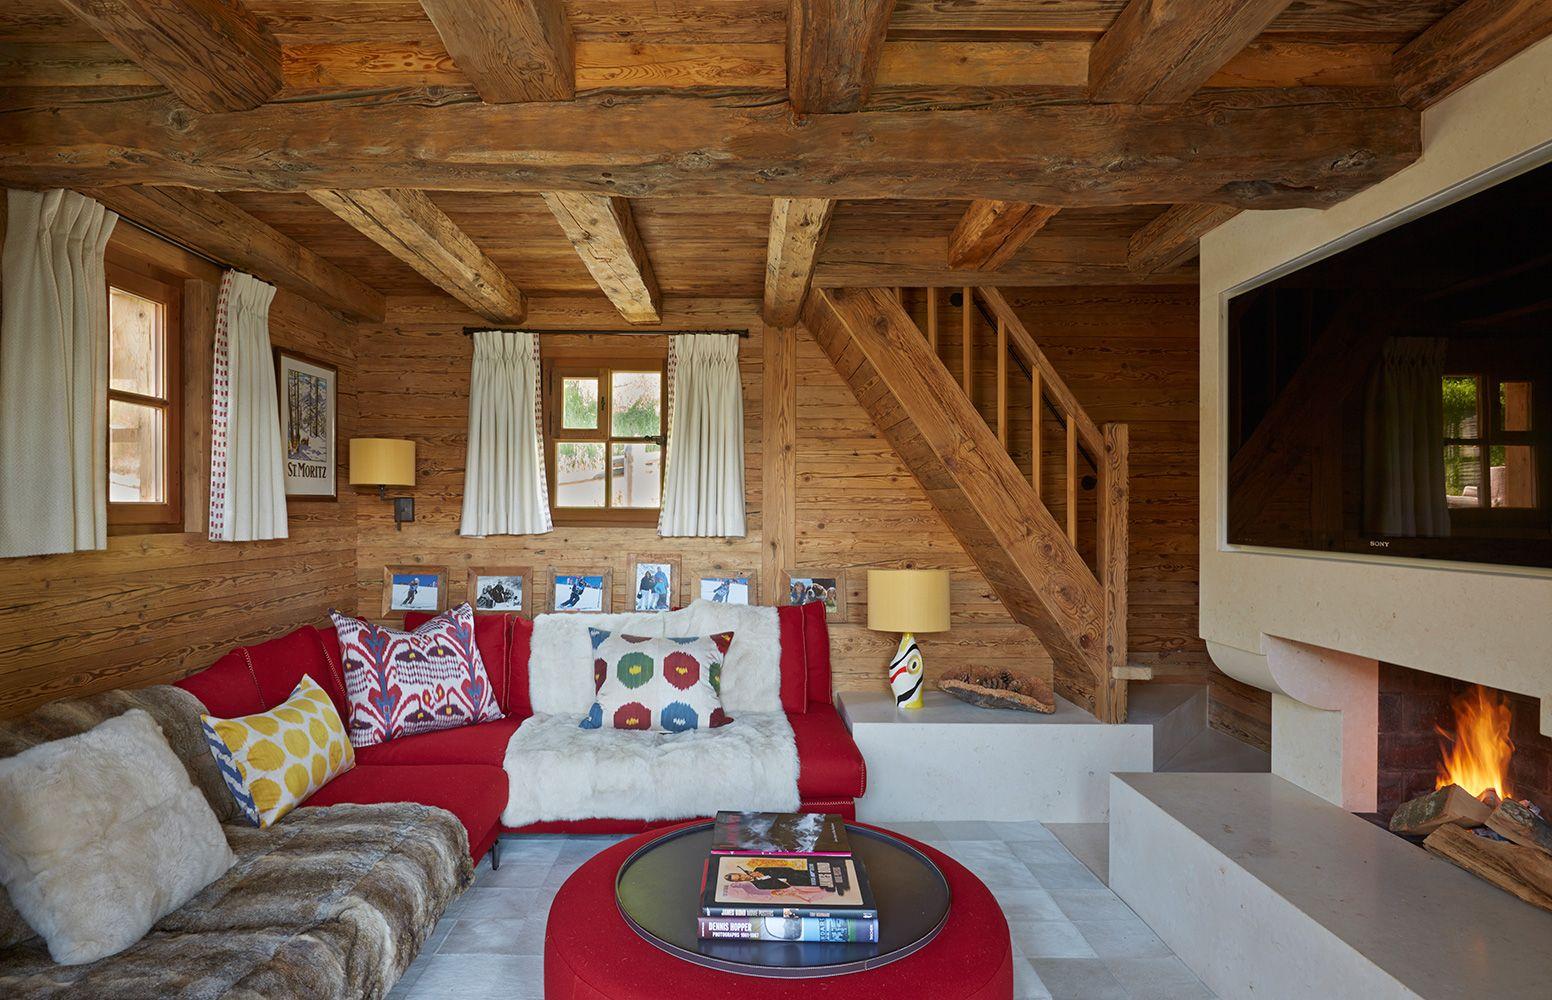 Swiss Chalet Decor Interior Design Chalets Swiss Chalet Todhunter